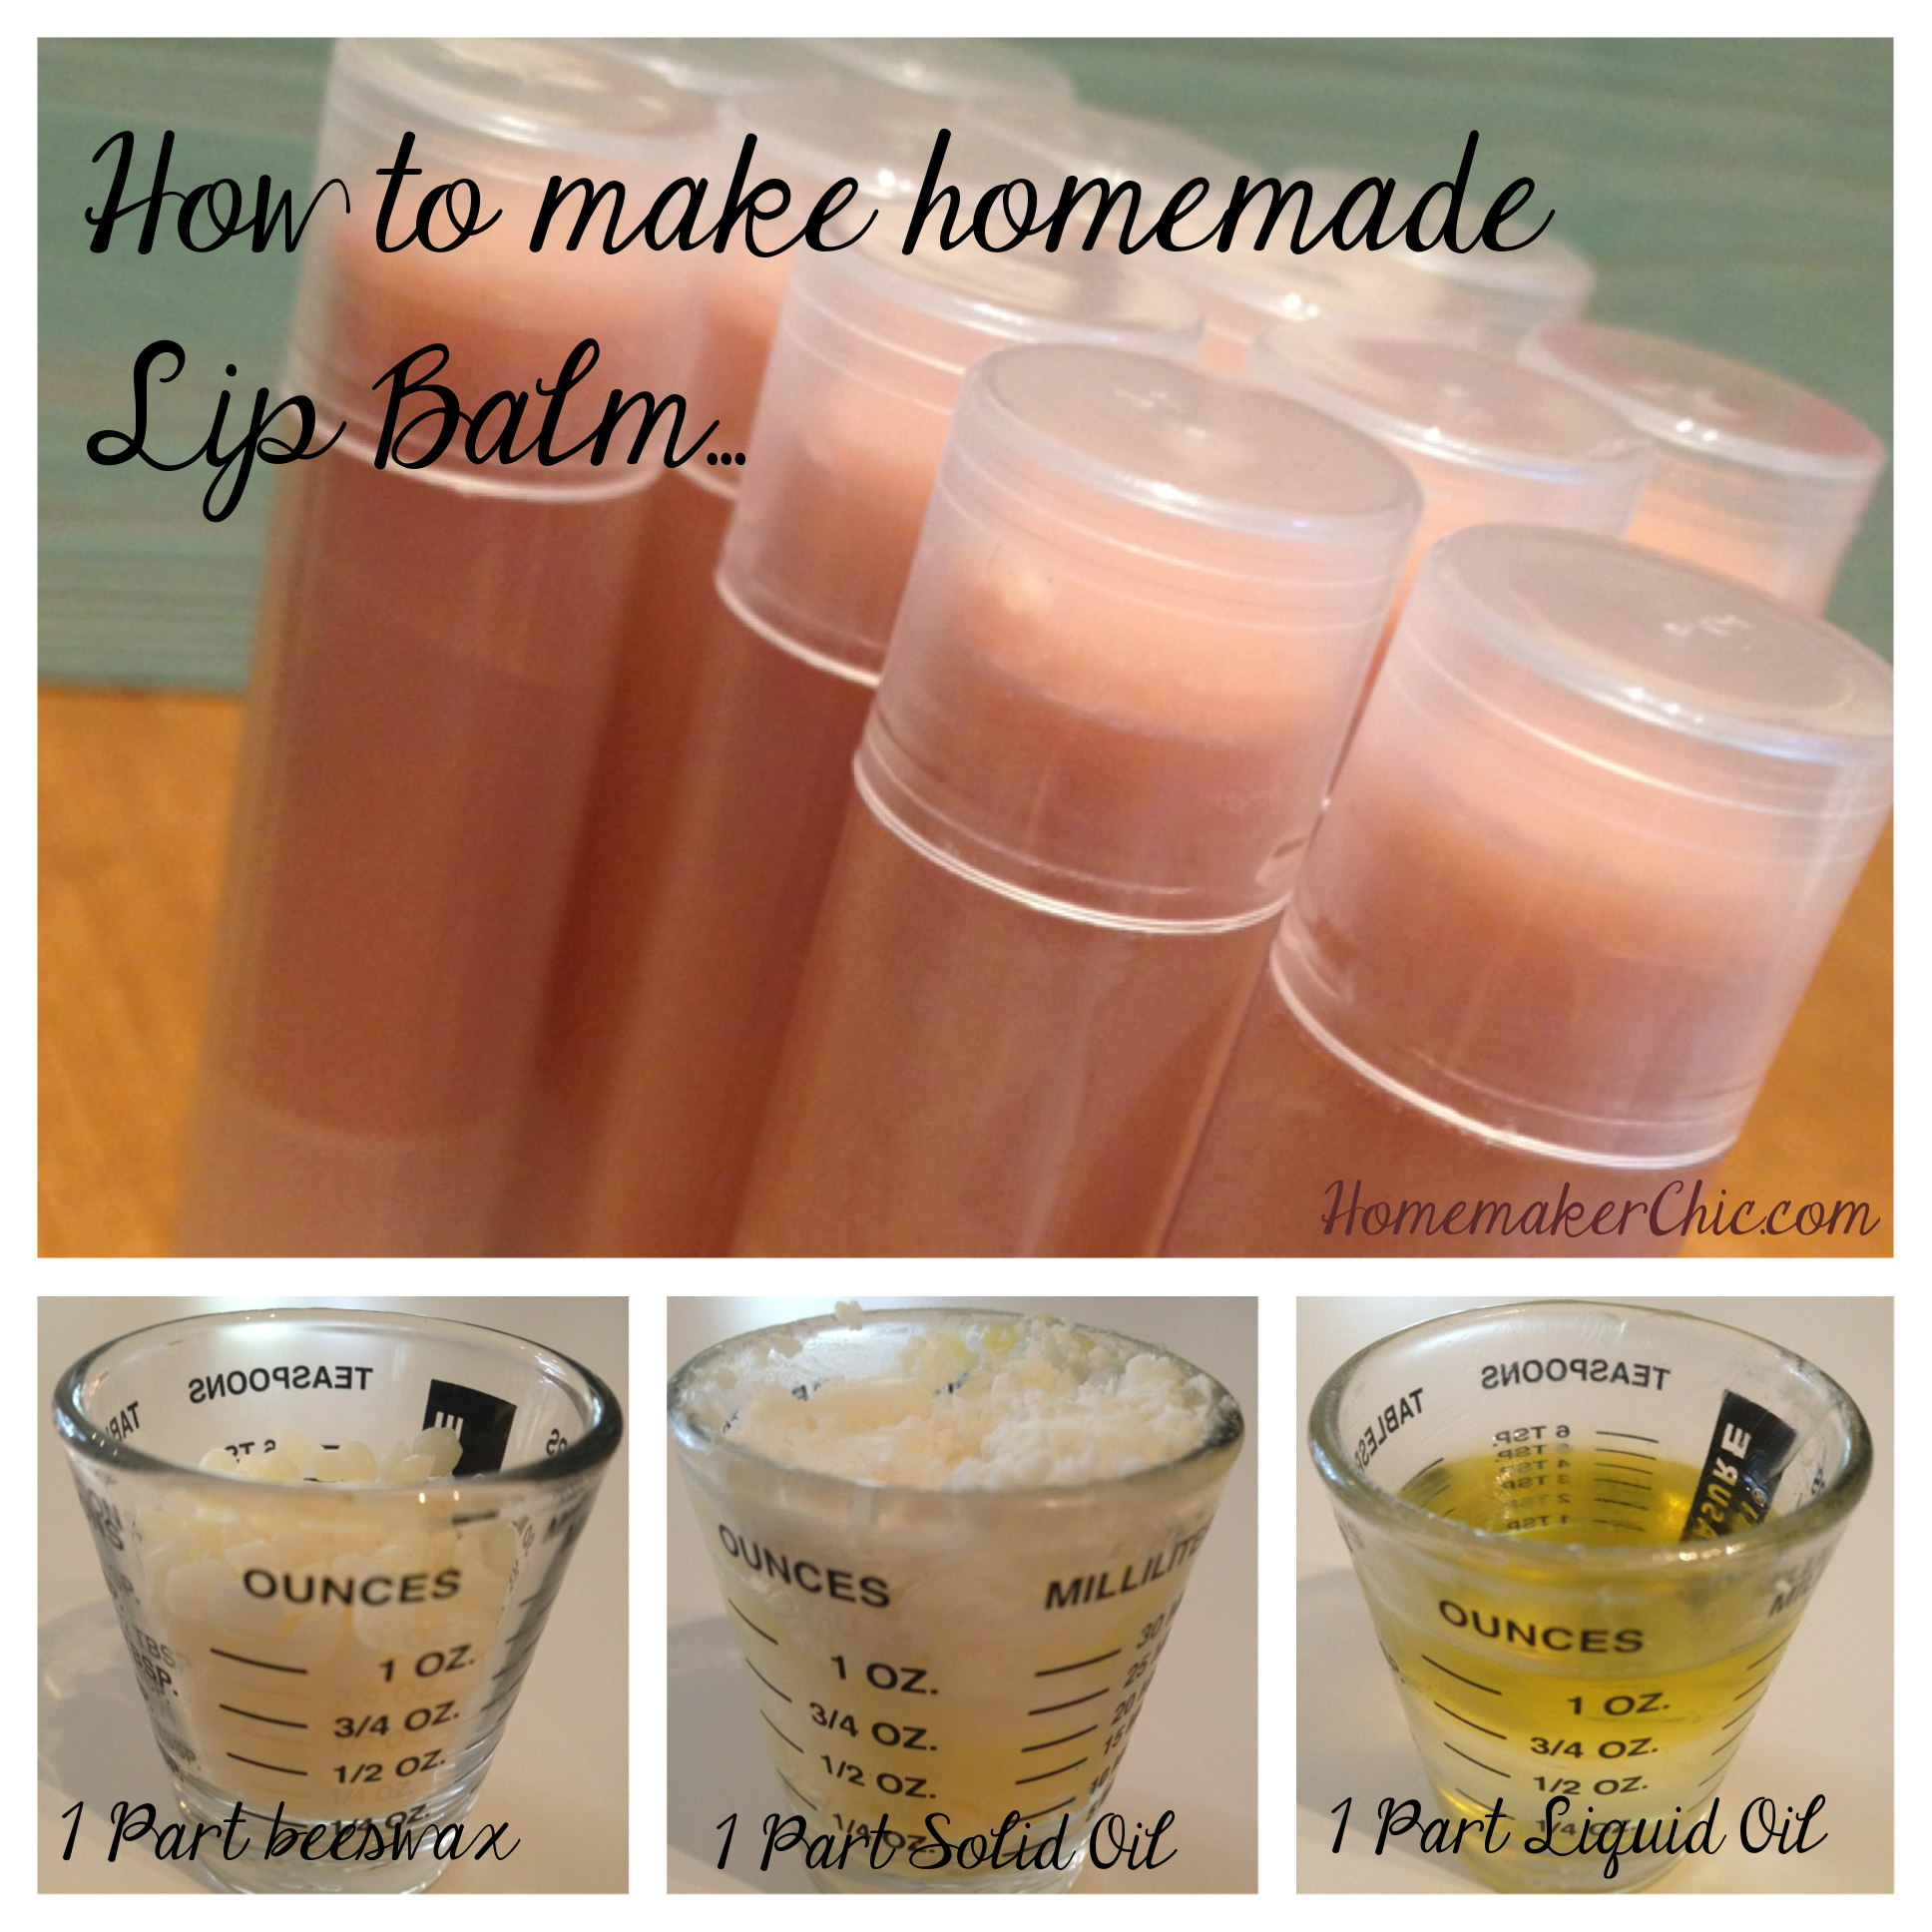 Homemade Citrus Lip Balm Tutorial | Homemaker Chic